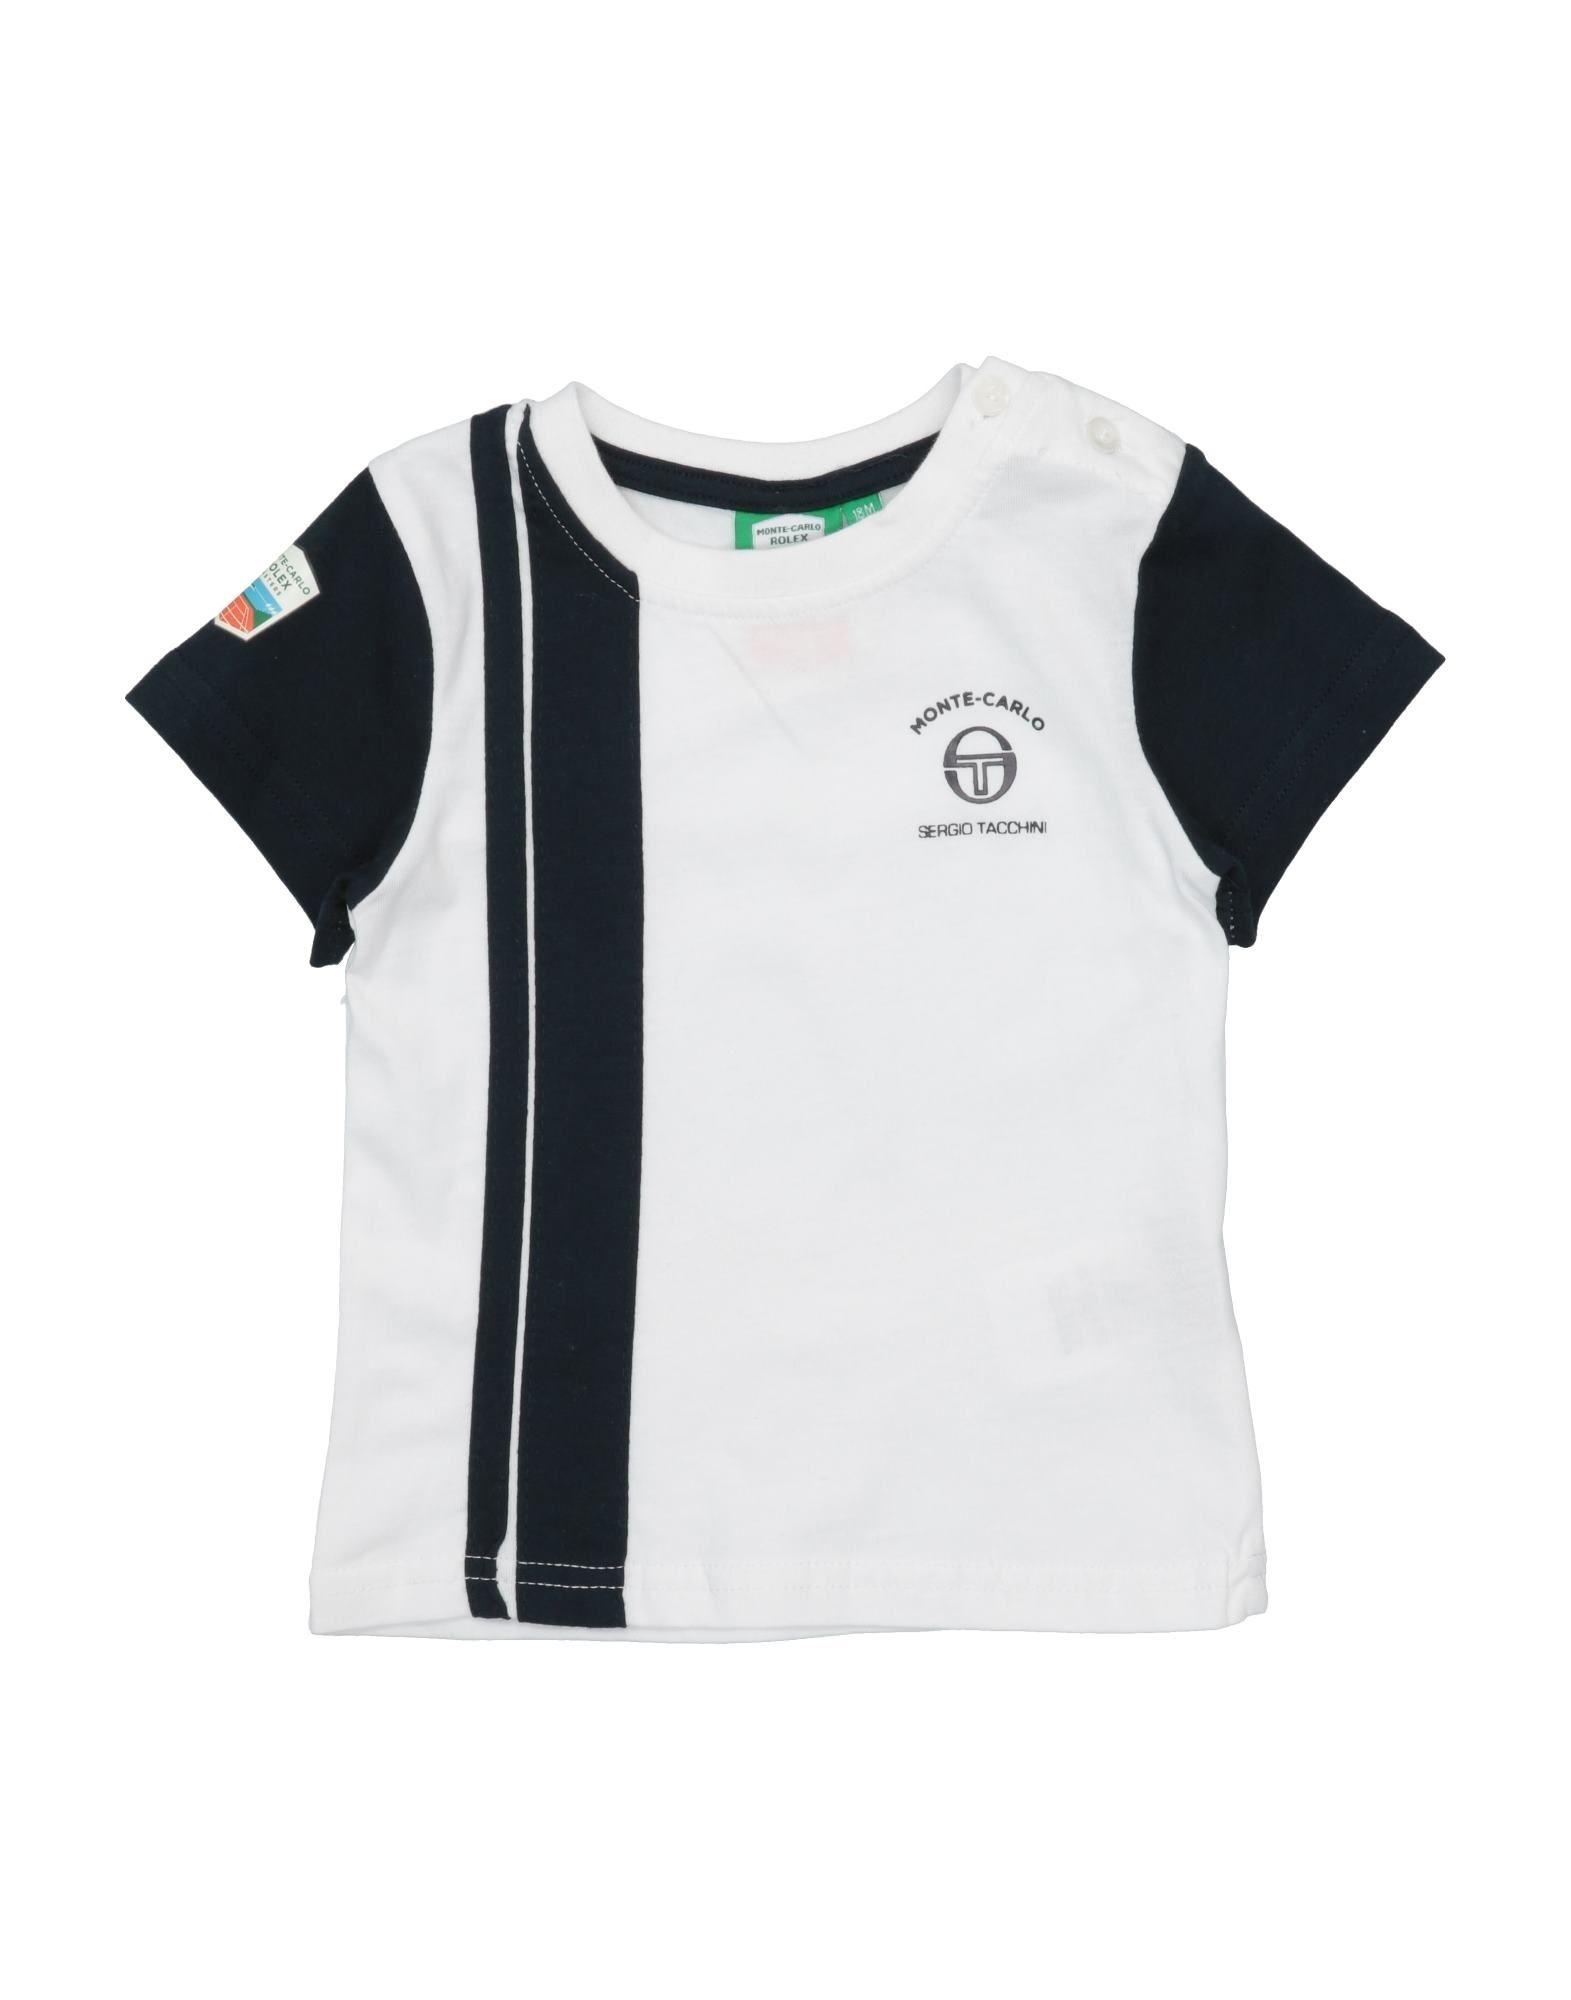 Sergio Tacchini Kids' T-shirts In White